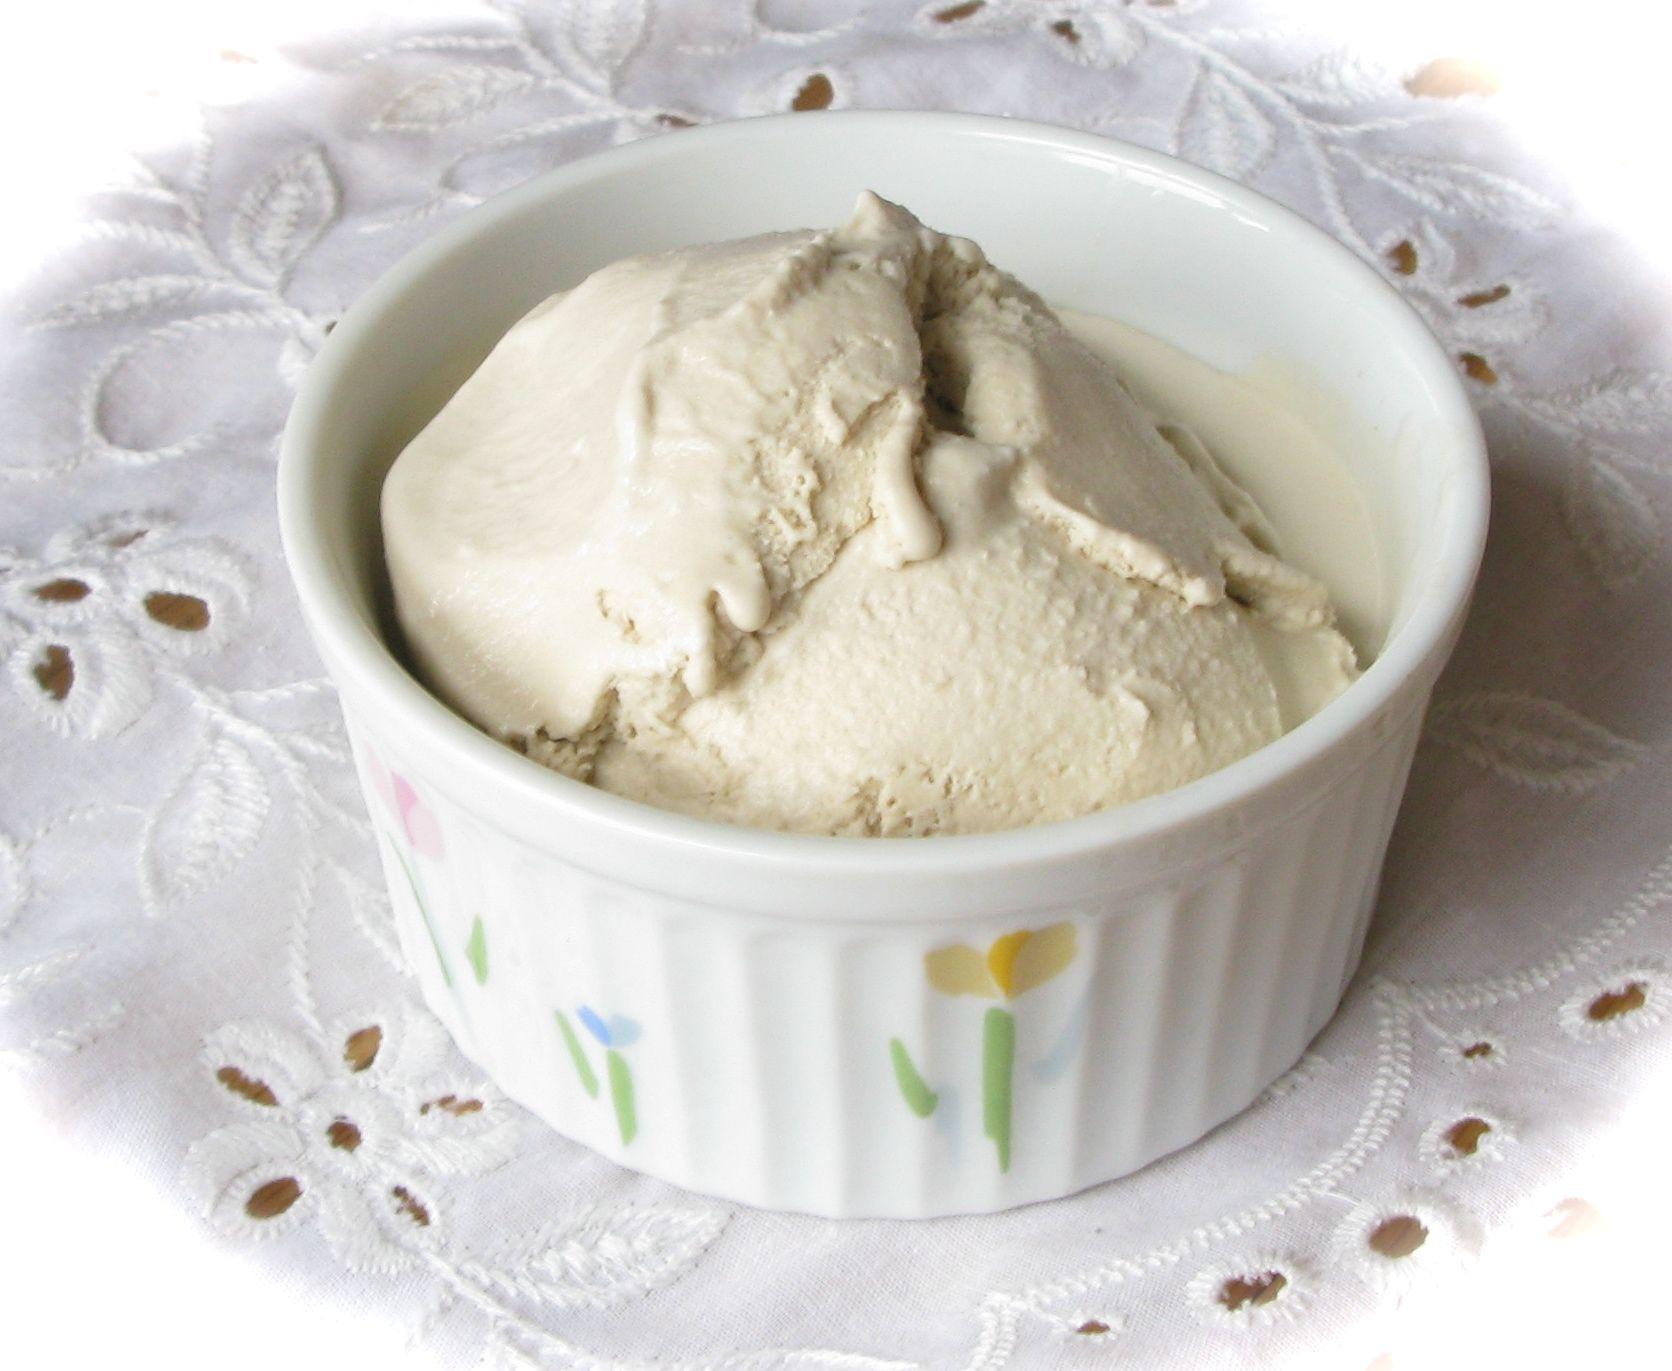 Coffee Ice Cream (Caffeine, Dairy, SugarFree & Vegan